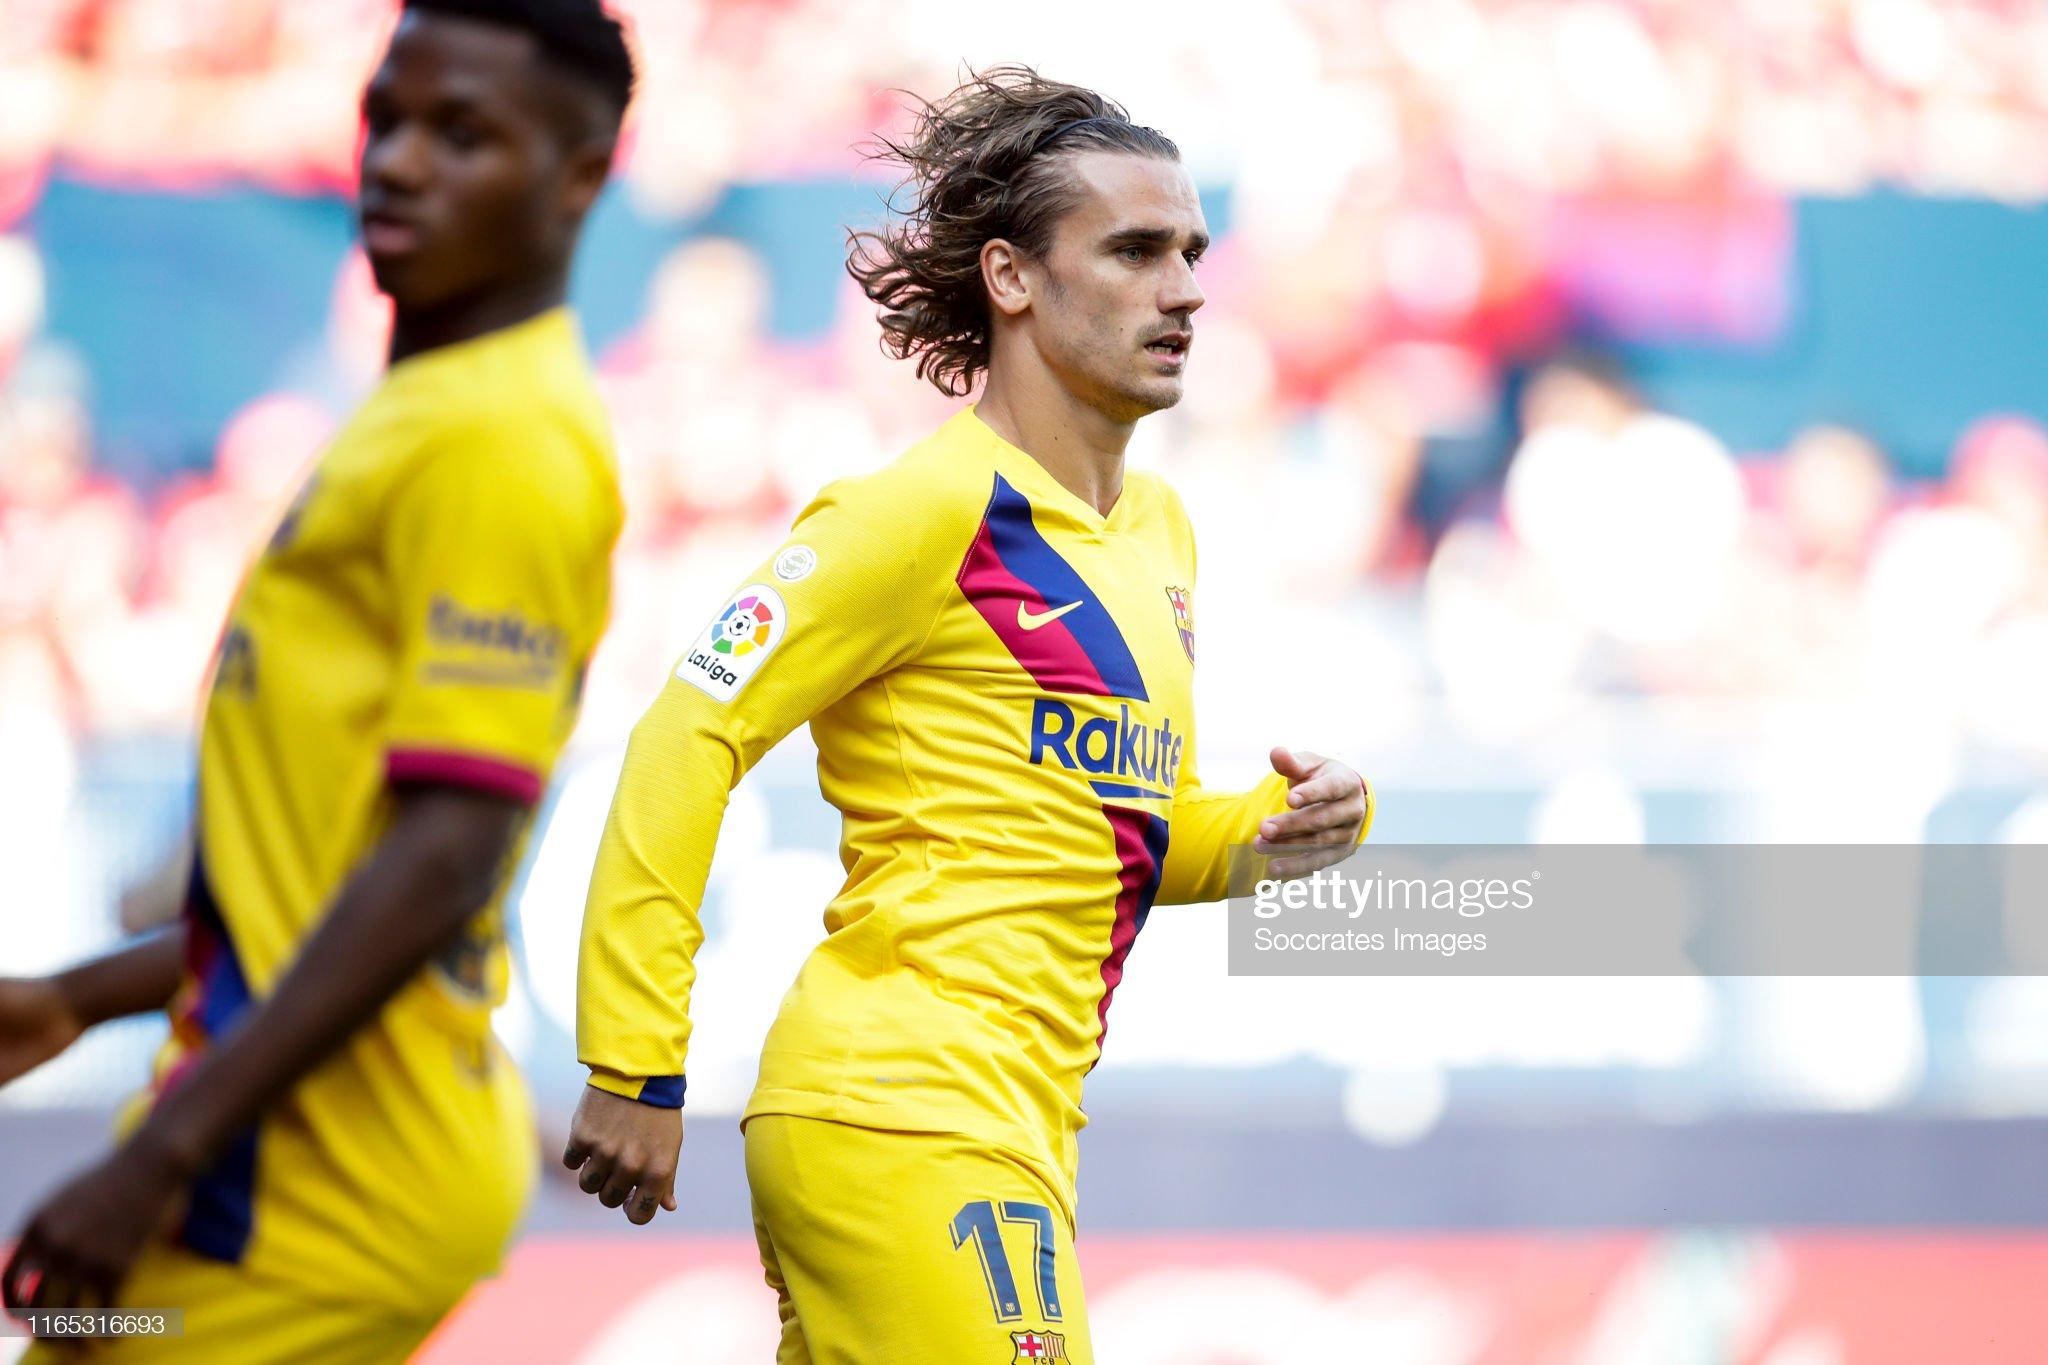 صور مباراة : أوساسونا - برشلونة 2-2 ( 31-08-2019 )  Antoine-griezmann-of-fc-barcelona-during-the-la-liga-santander-match-picture-id1165316693?s=2048x2048